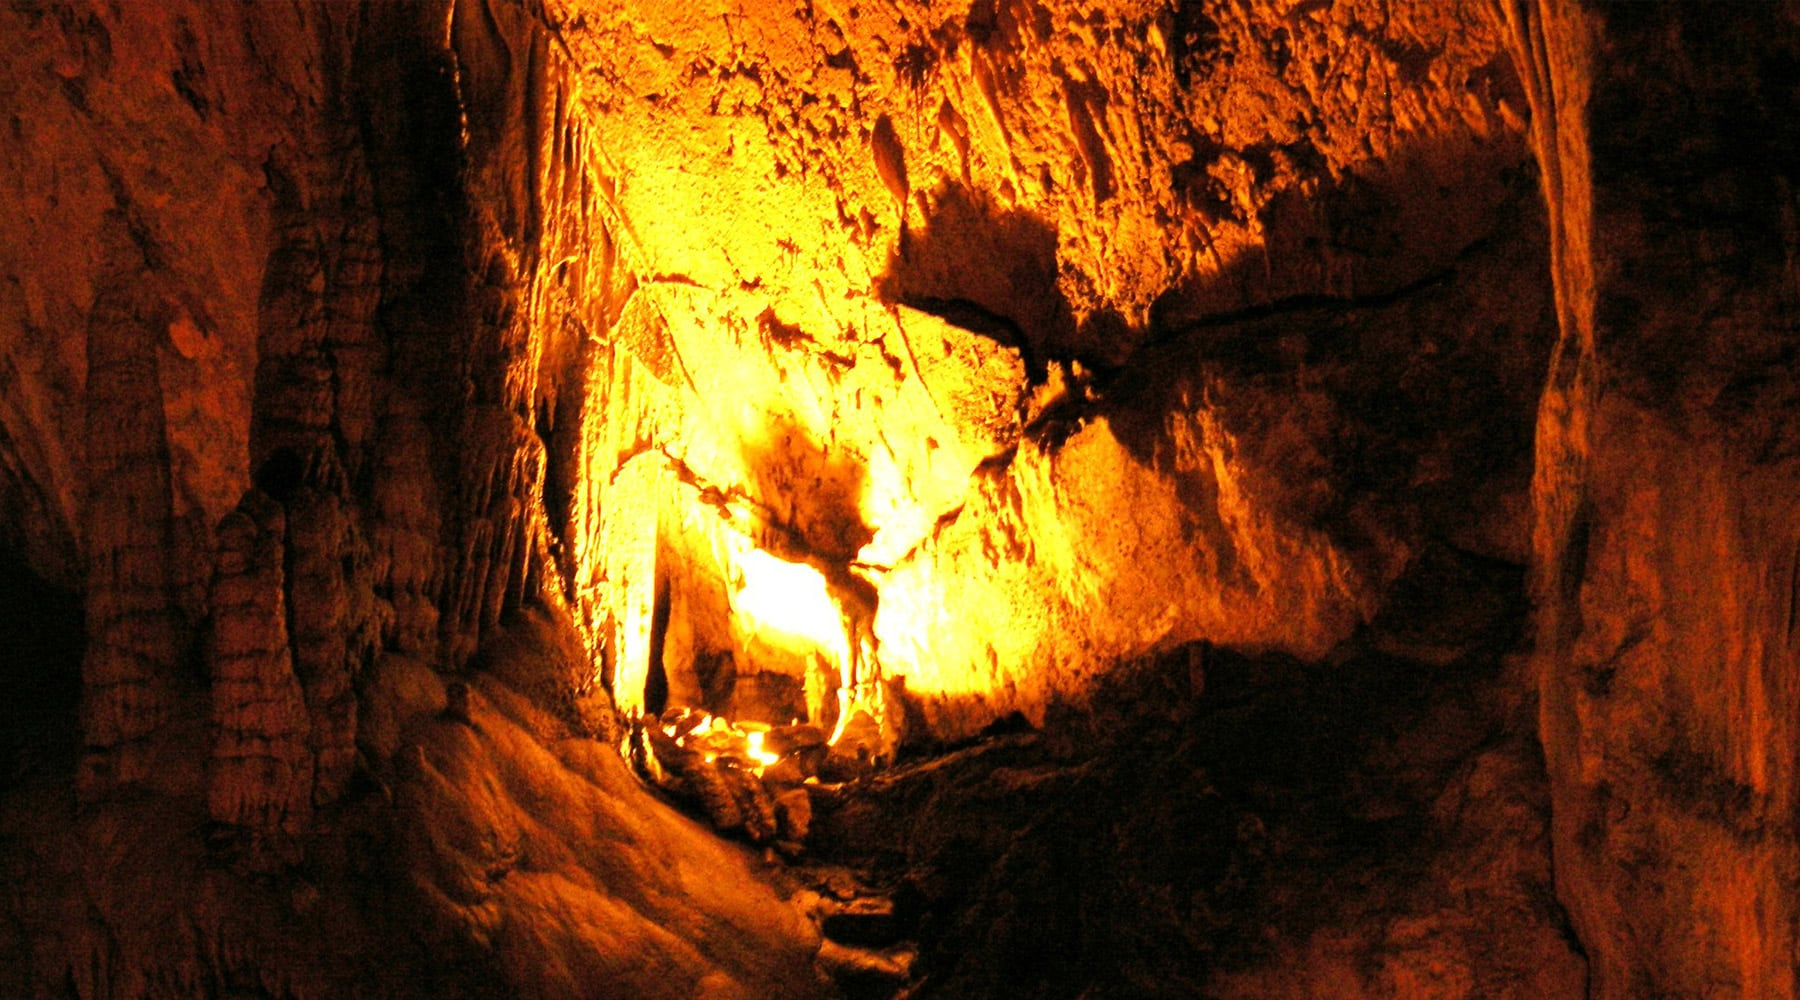 Dim Cave – The Second Biggest Cave in Turkey